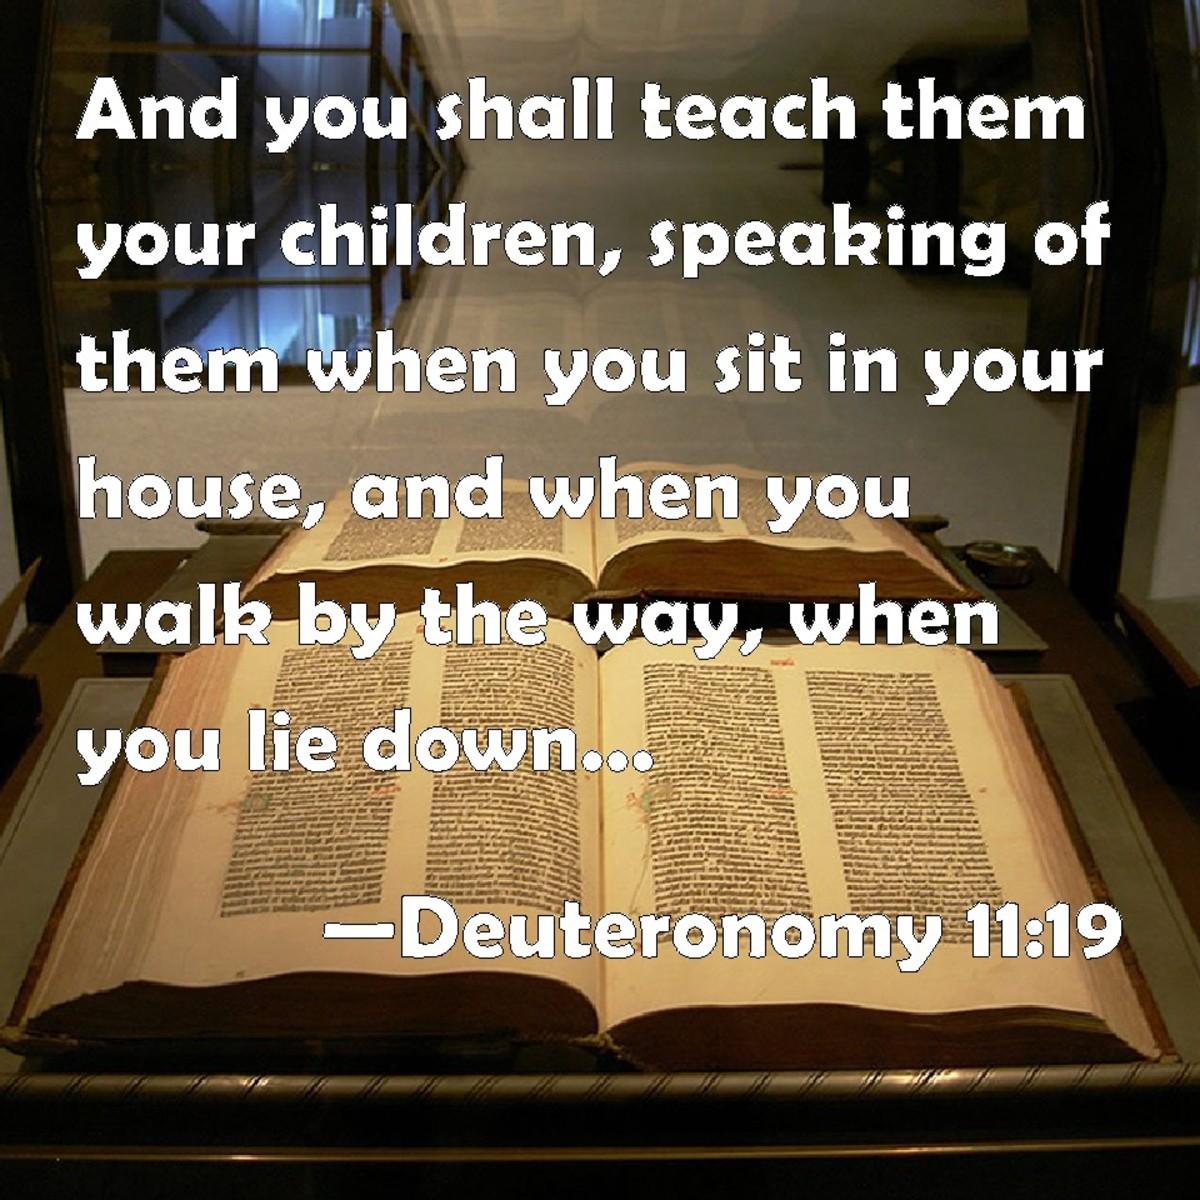 Teach them ... when you sit ... when you walk ... when you lie down.